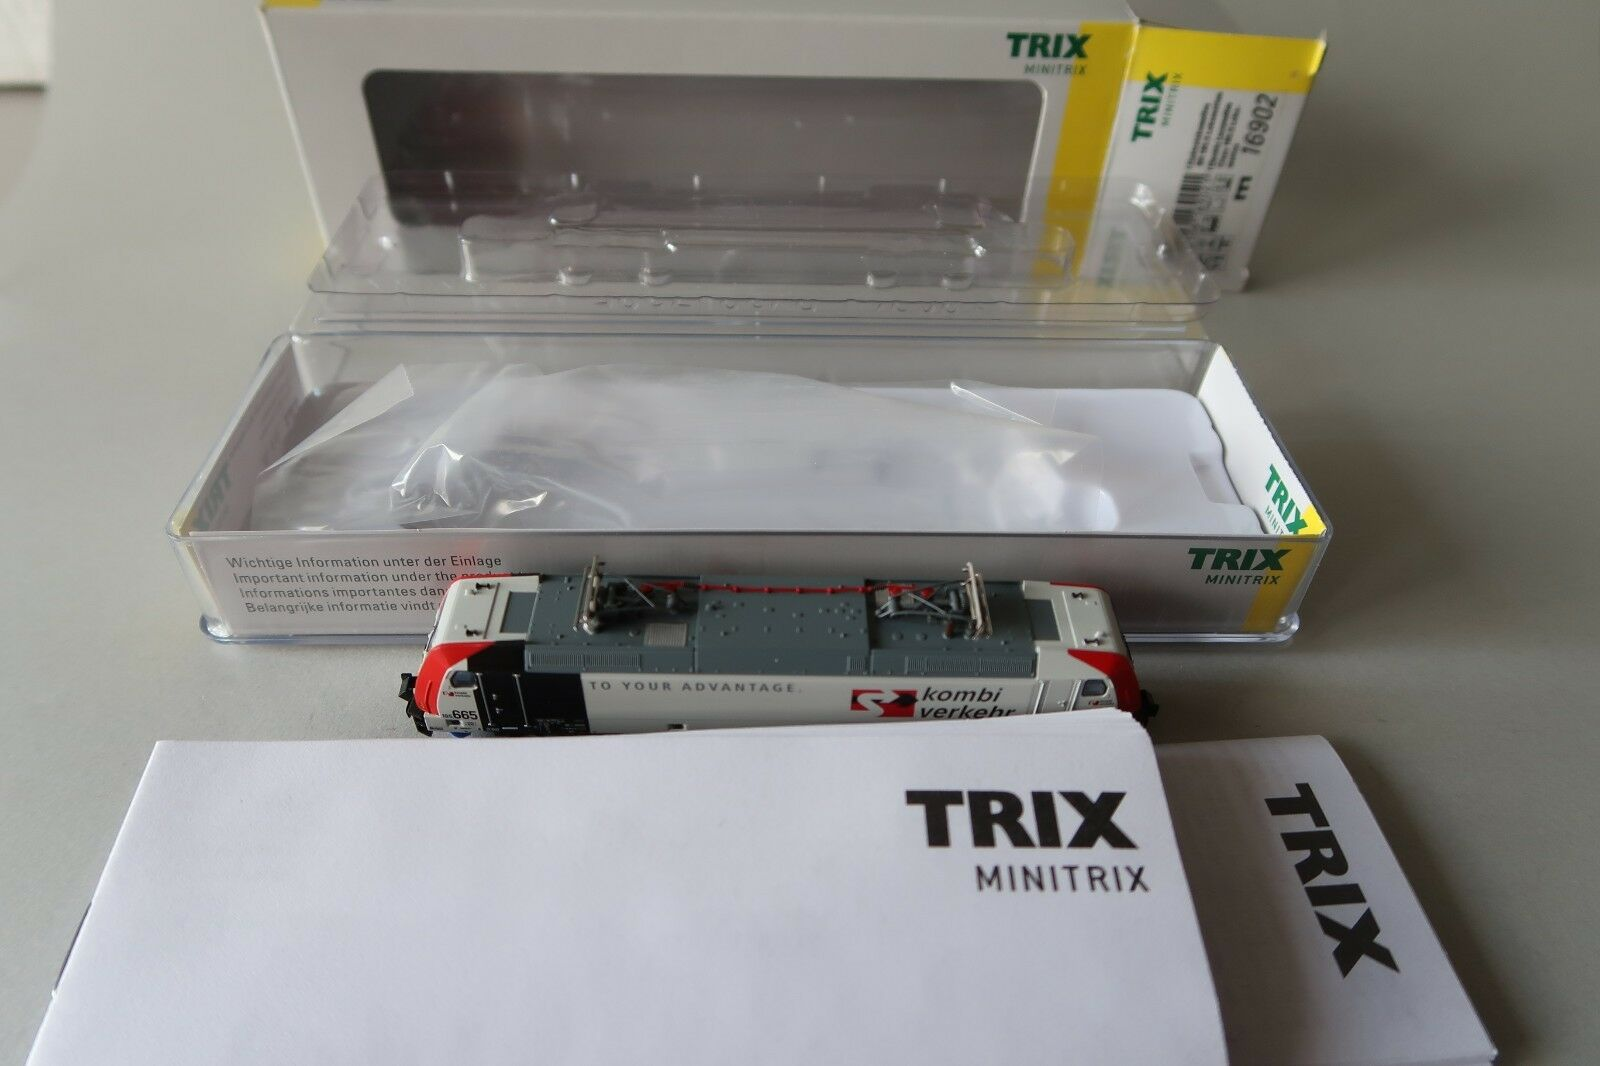 Minitrix n 16902 e-Lok br 6185 665-7 D-LM  transporte combinado  mhi (du188-69s5 2)